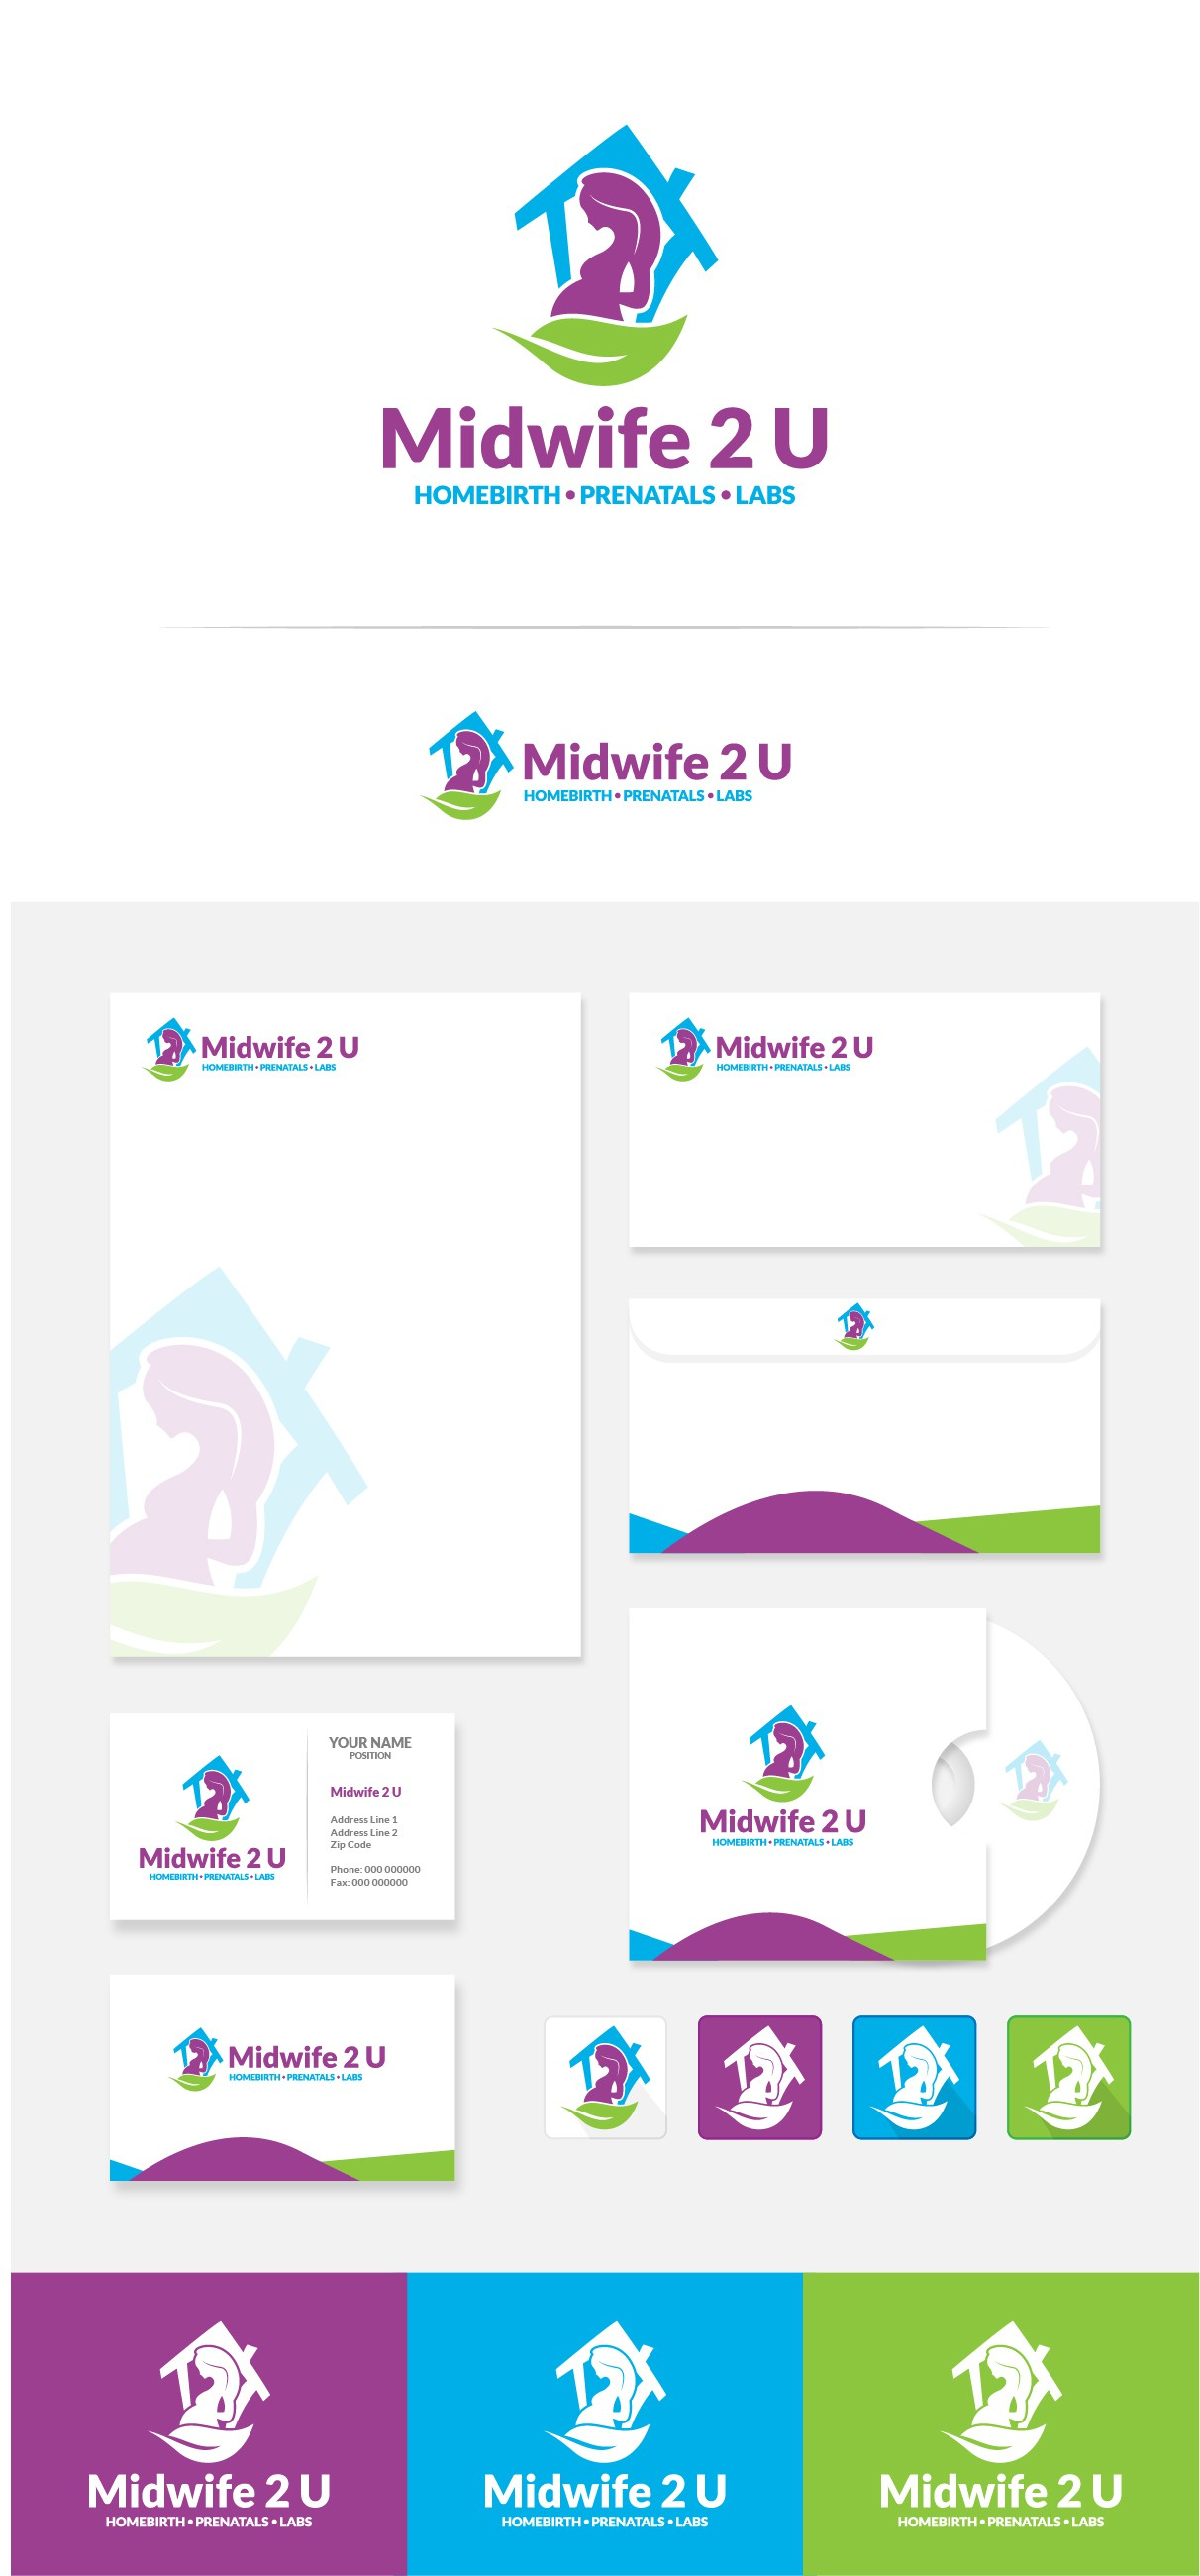 HOMEBIRTH Midwife needs an amazing logo